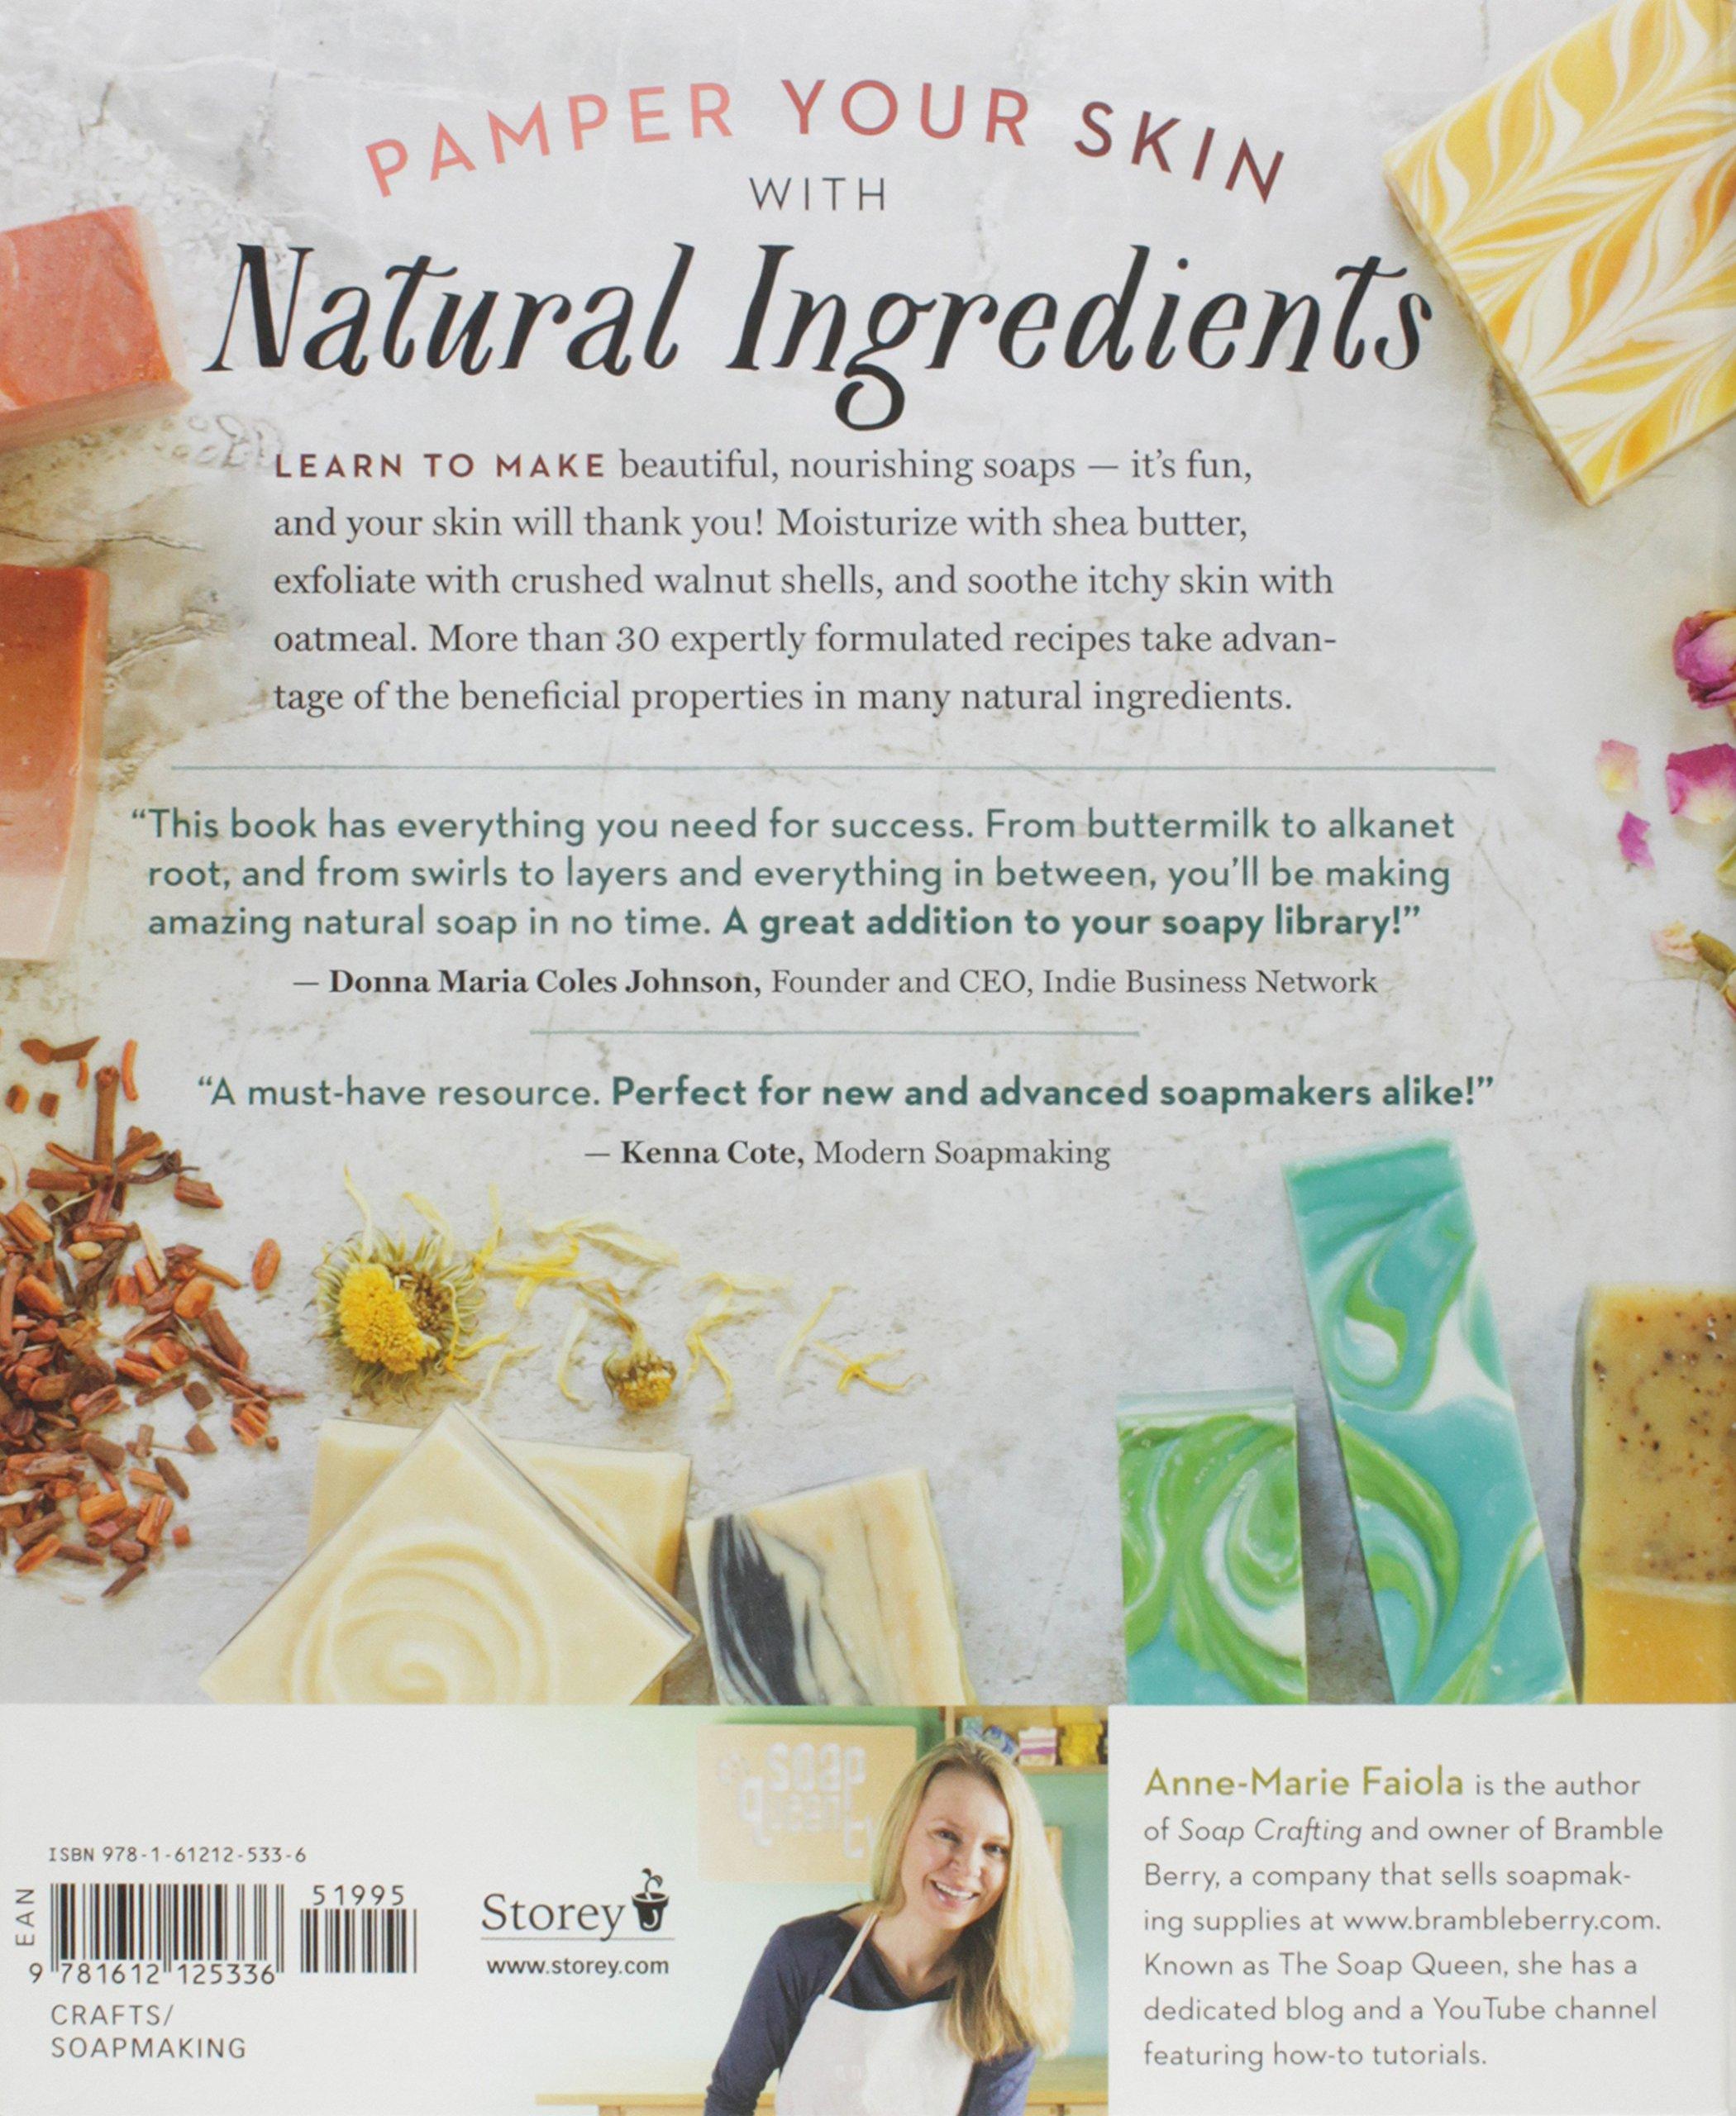 Pure Soapmaking: Amazon.es: Anne-Marie Faiola: Libros en idiomas extranjeros